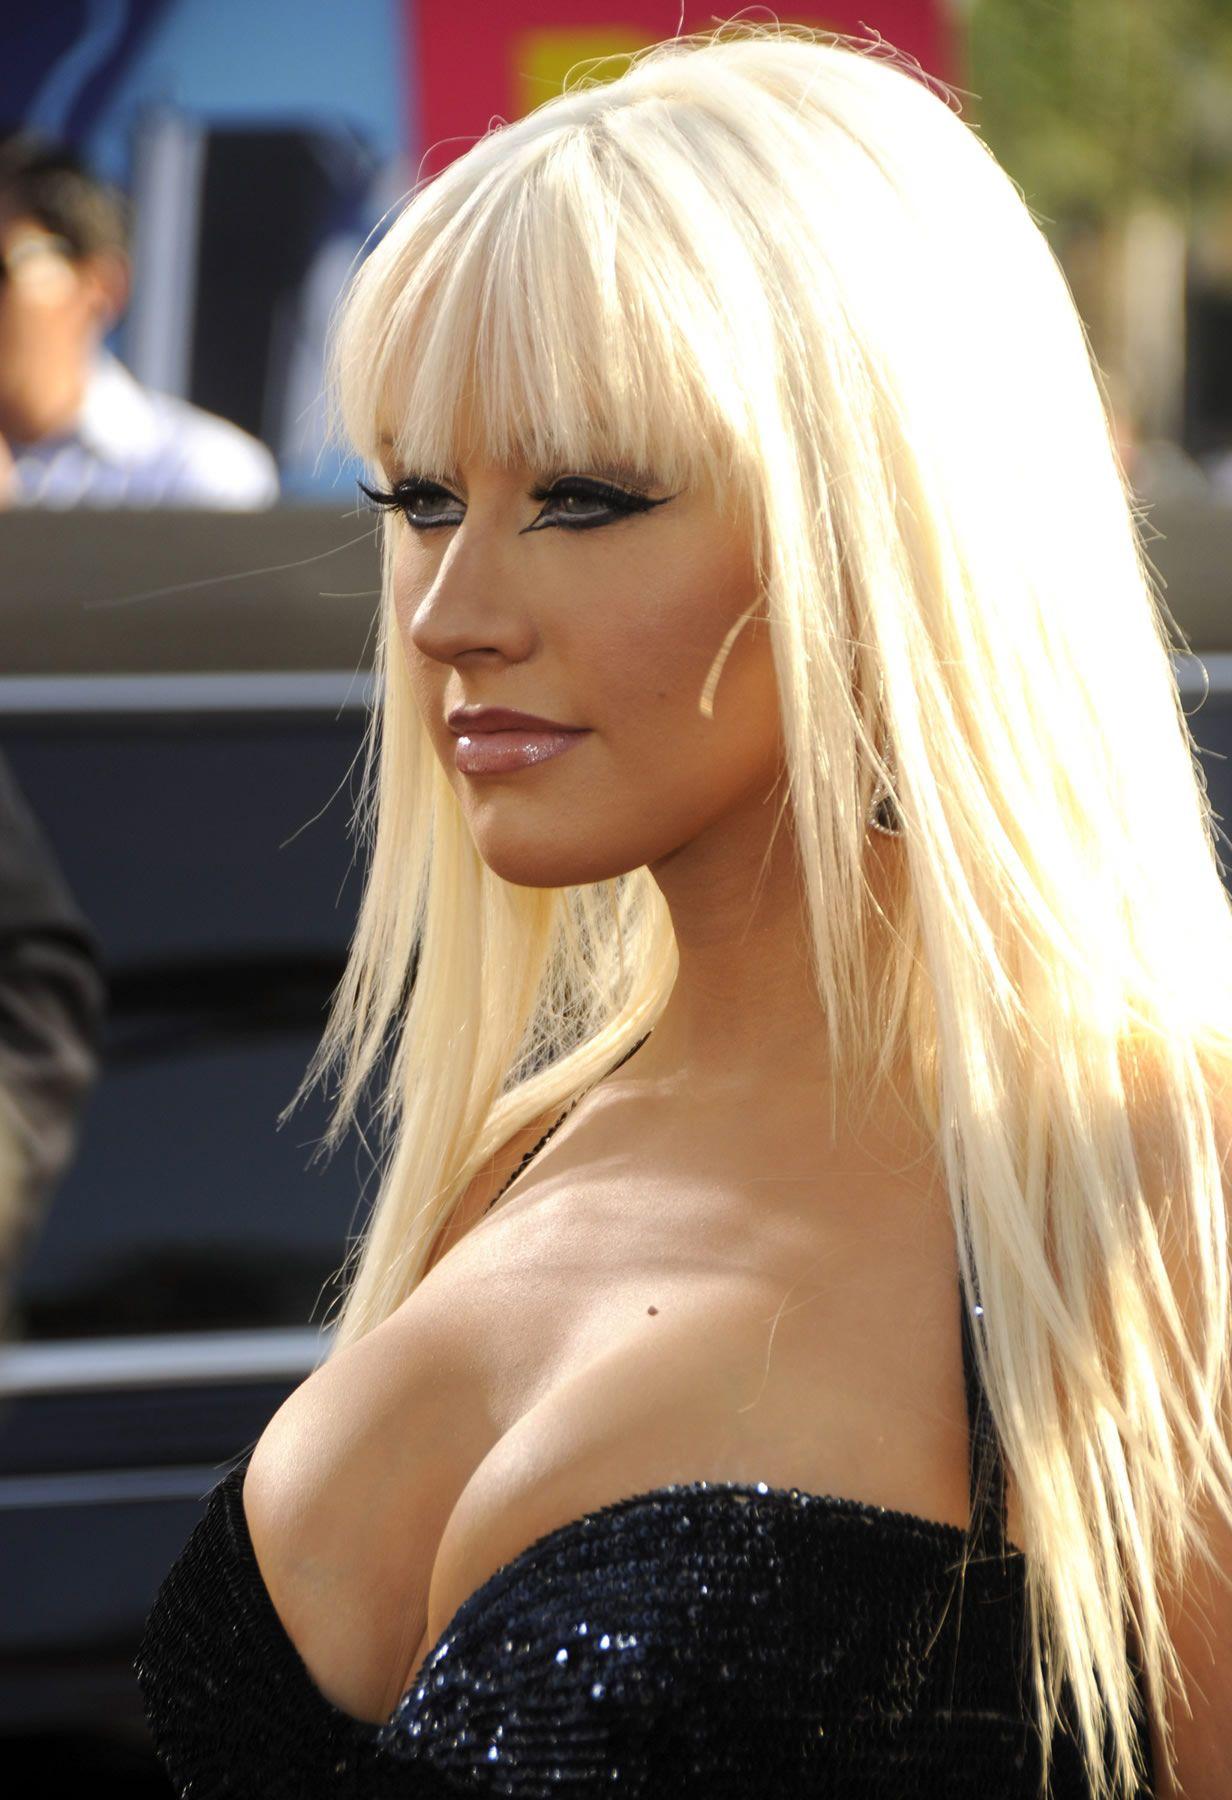 Hot Christina Aguilera nude (97 photo), Ass, Sideboobs, Boobs, bra 2006